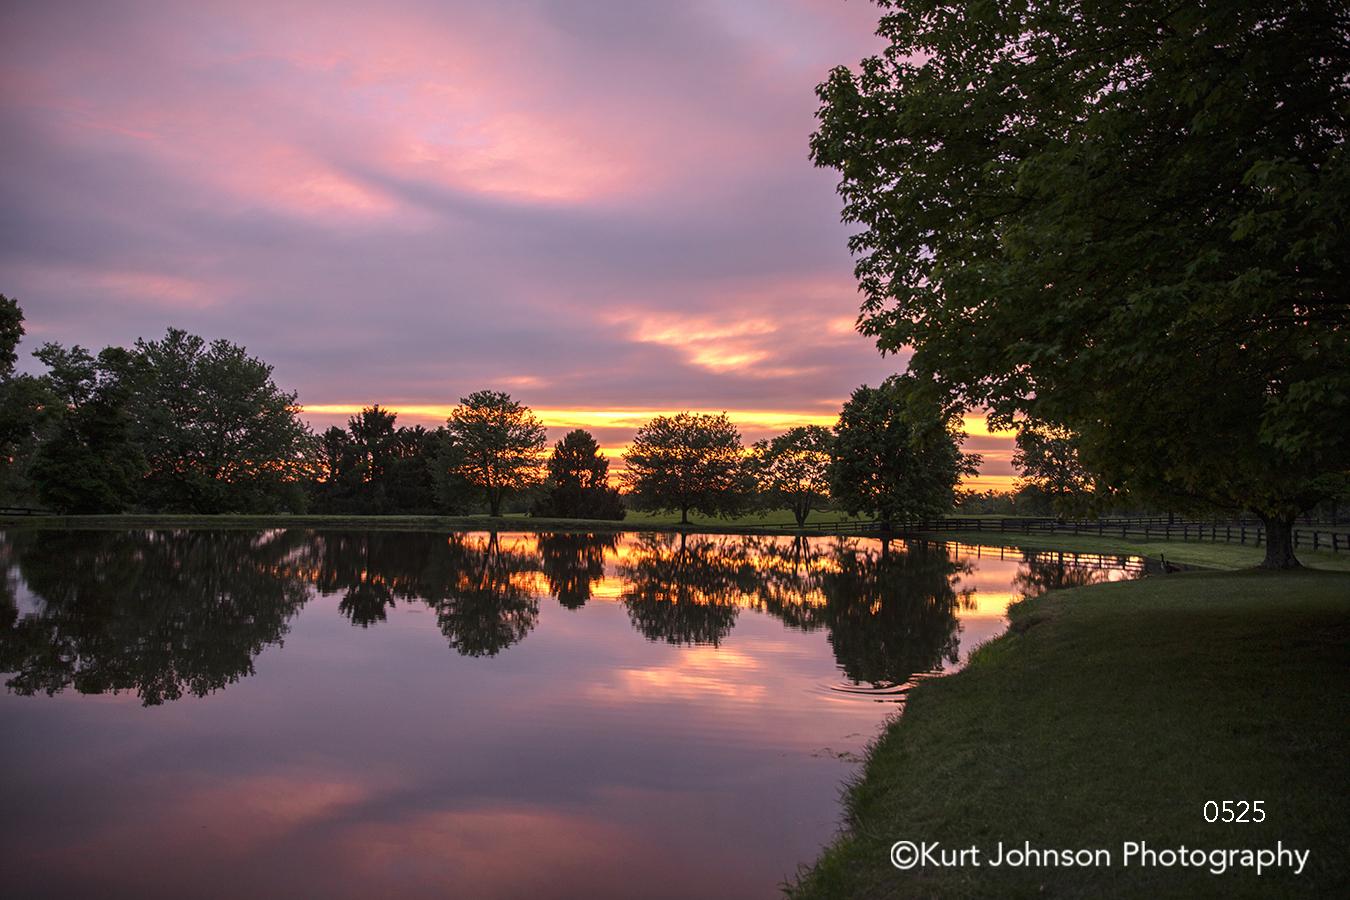 purple pink orange sky sunset sunrise calm still water reflection trees light waterscape landscape